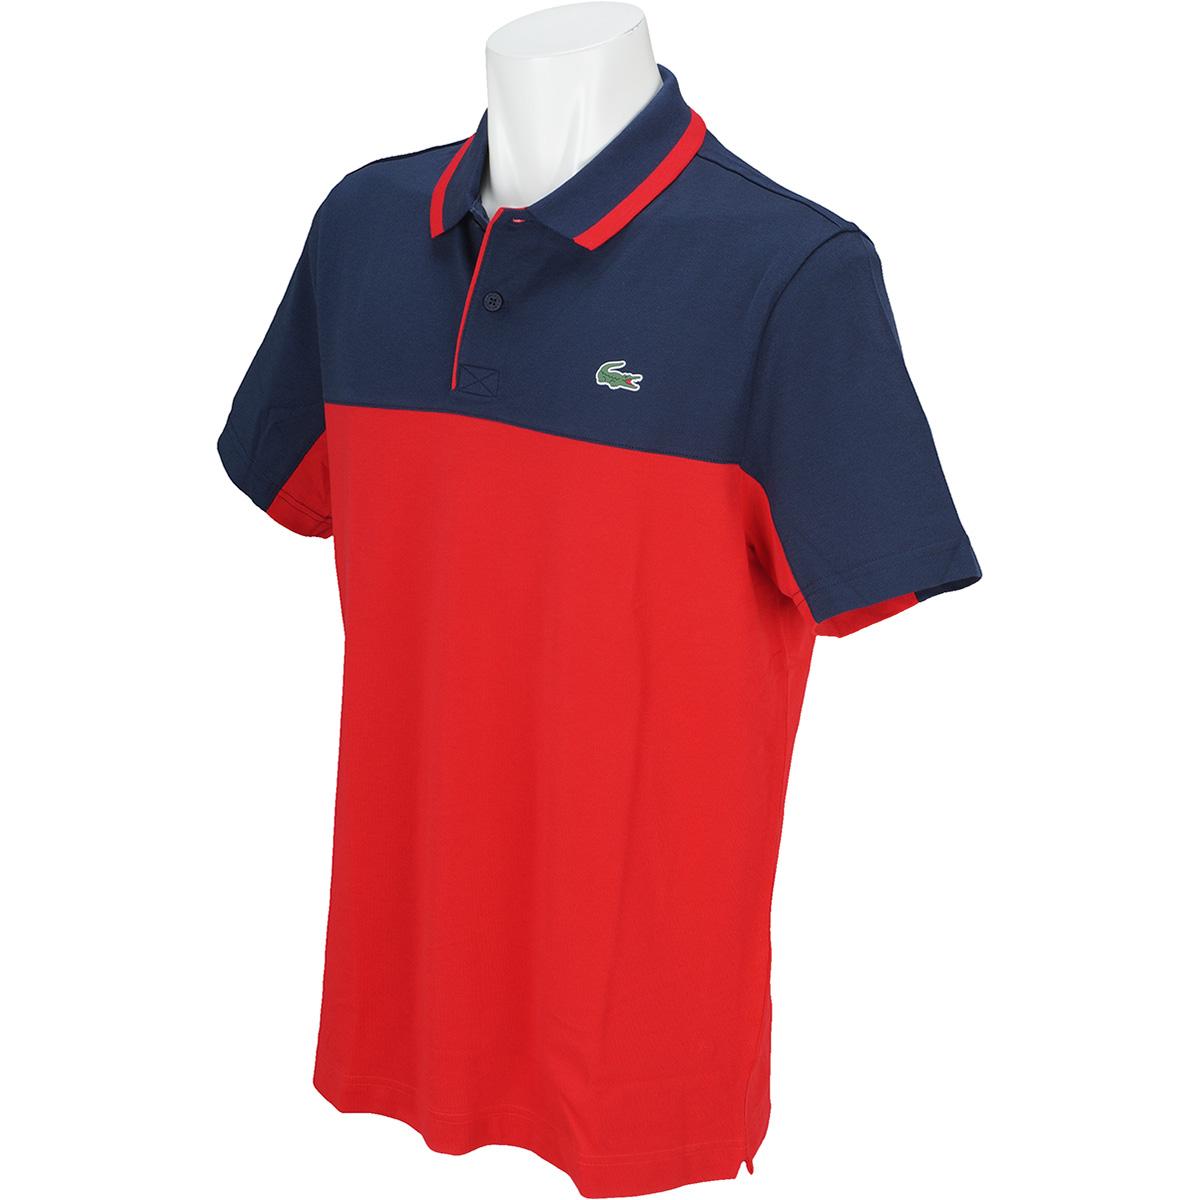 SPORT GOLF カラーブロック テクニカルプチピケ 半袖ポロシャツ